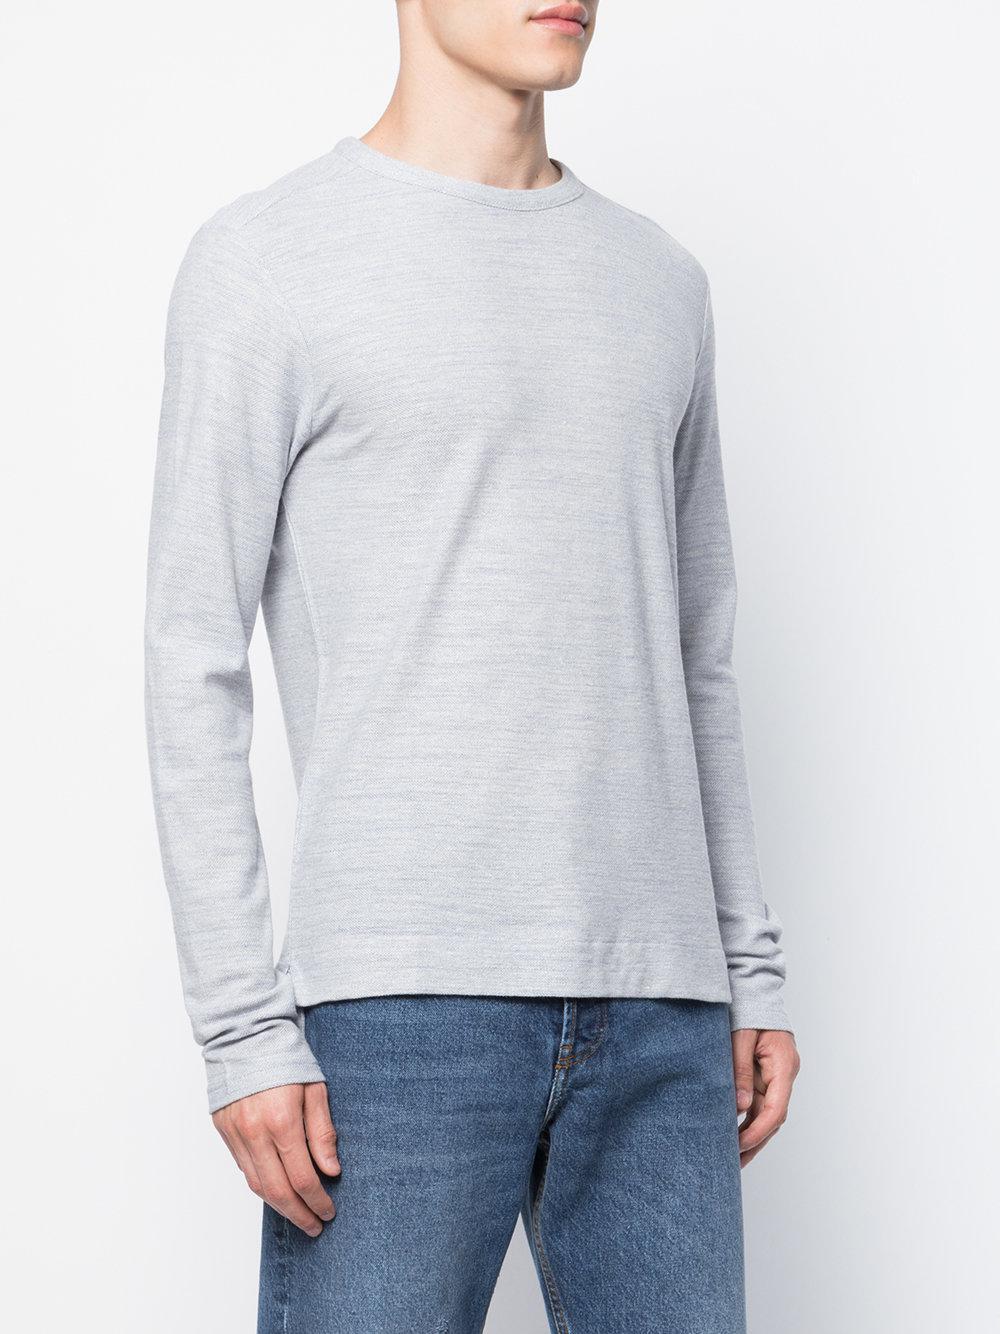 Chako long sleeve T-shirt - Blue Homecore Very Cheap Price T5bUV8